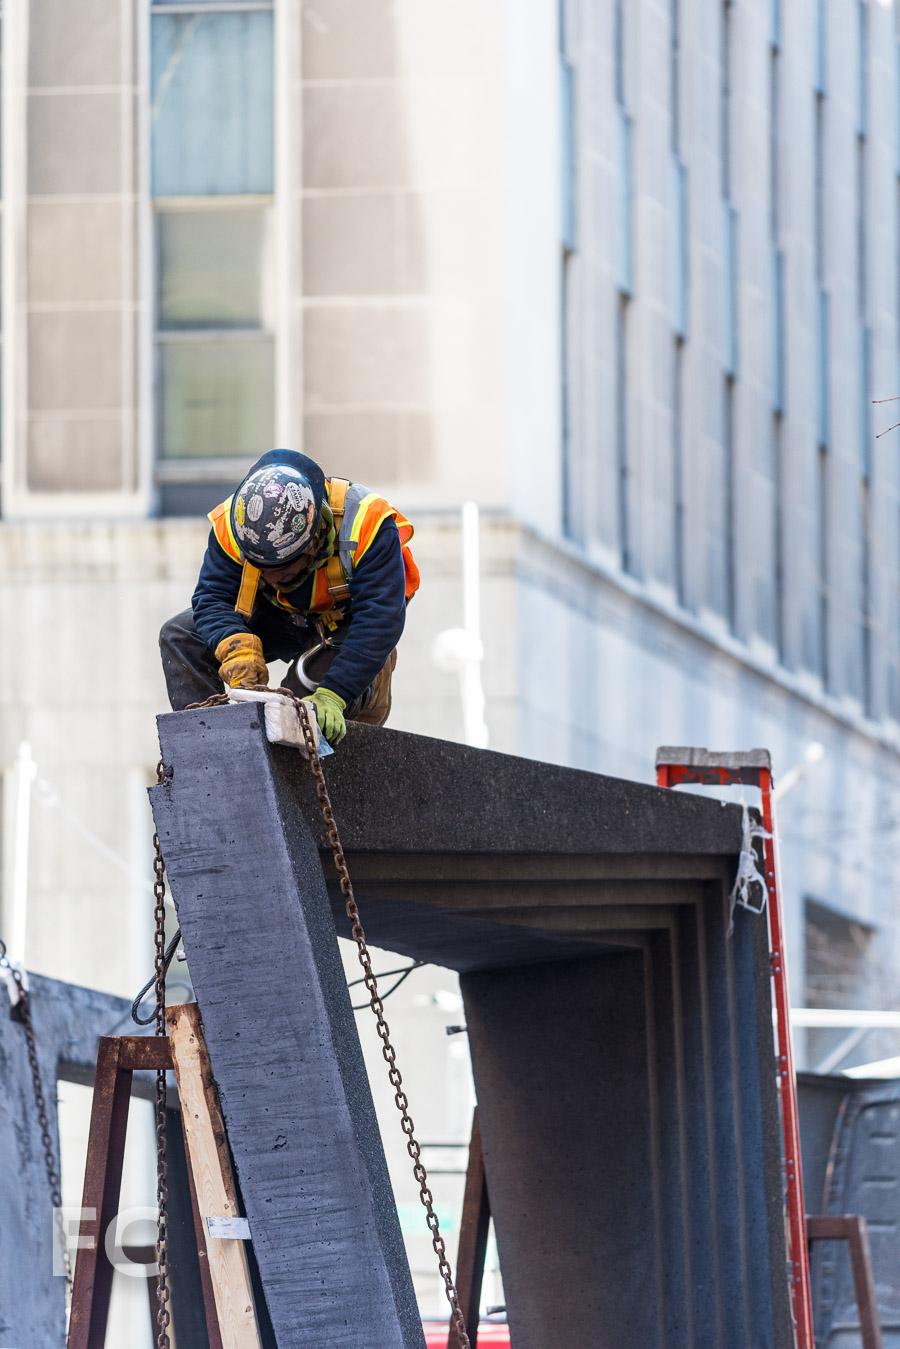 Construction worker prepares precast panel for the crane lift.